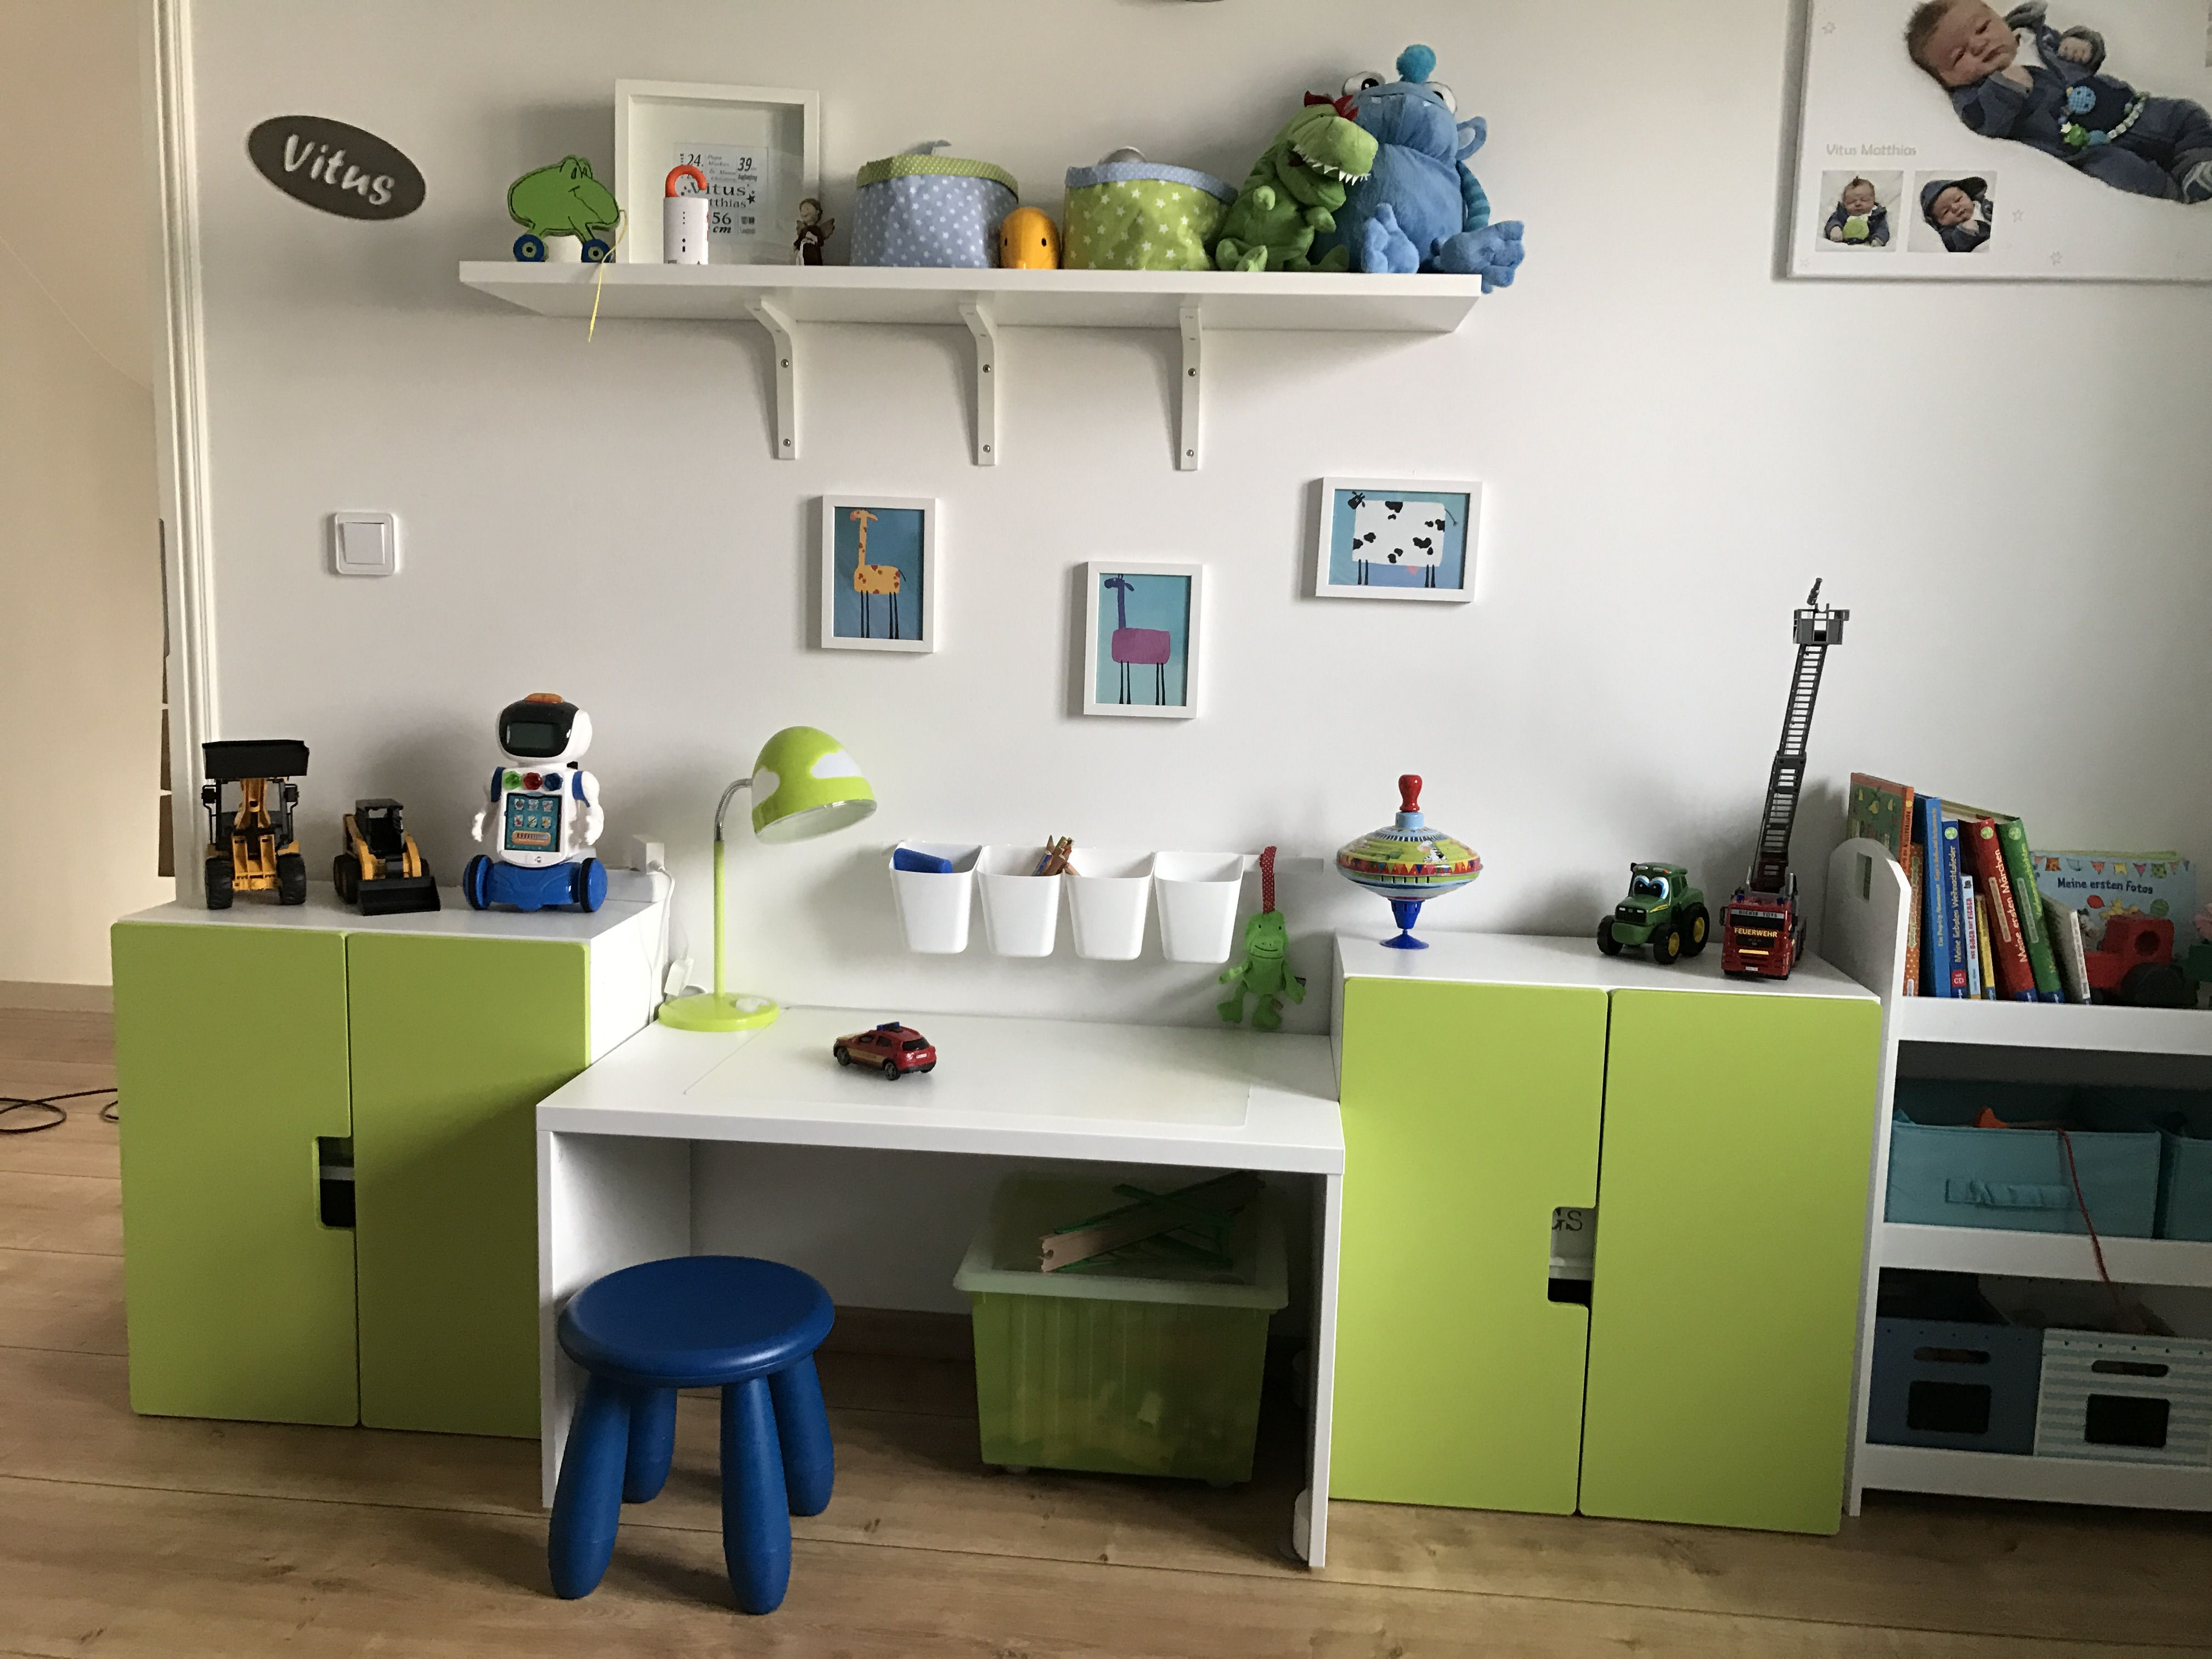 Boys working place IKEA Stuva Kinderzimmer junge, Kinder